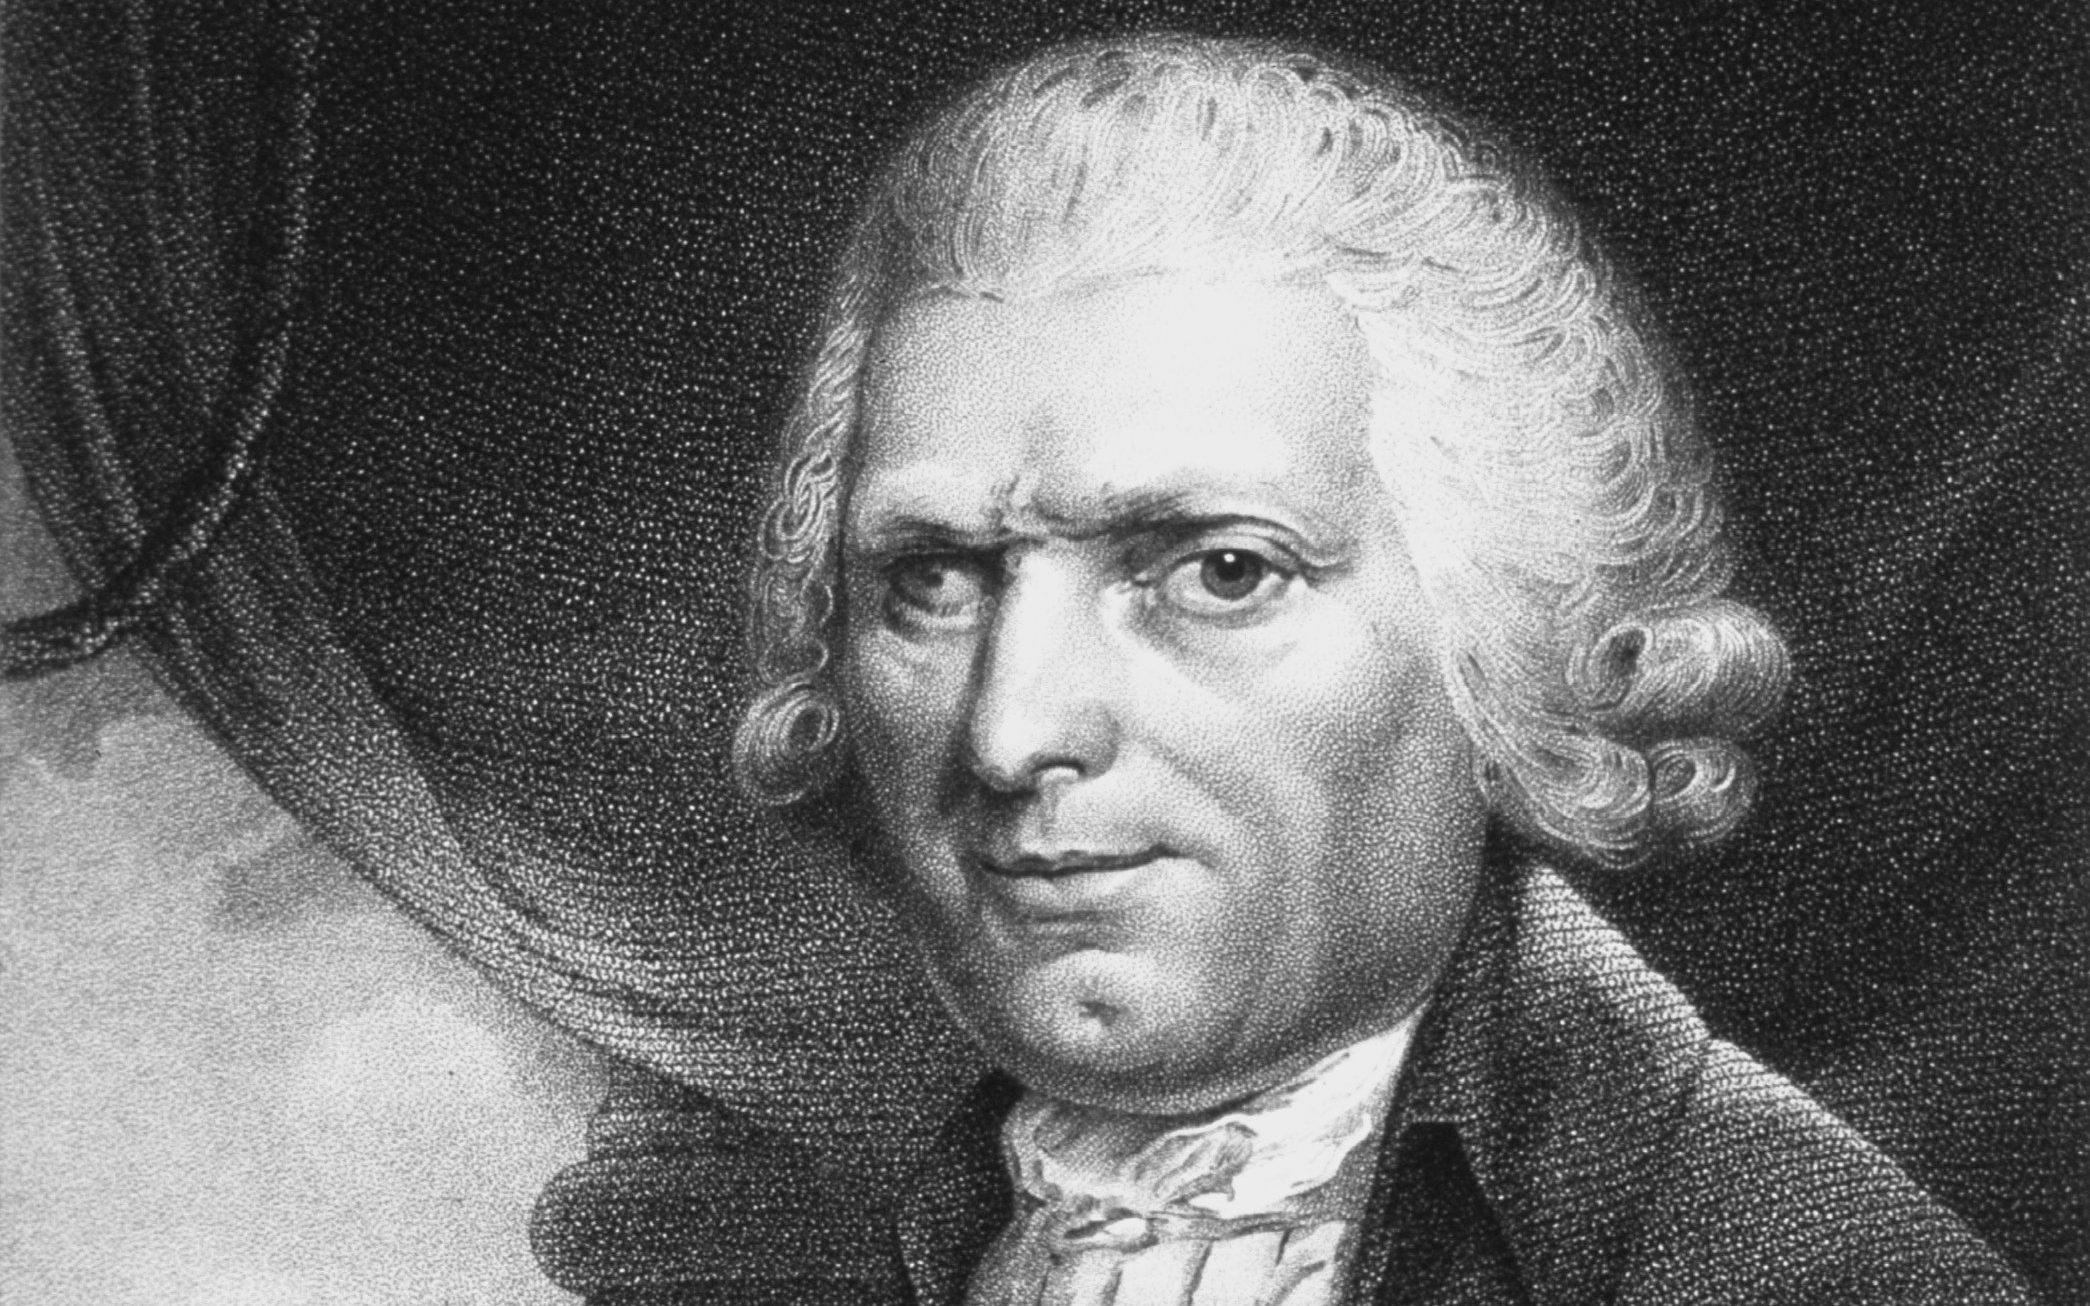 William Hey FRS, (1736-1819); Surgeon, twice Mayor of Leeds, friend of Joseph Priestley.